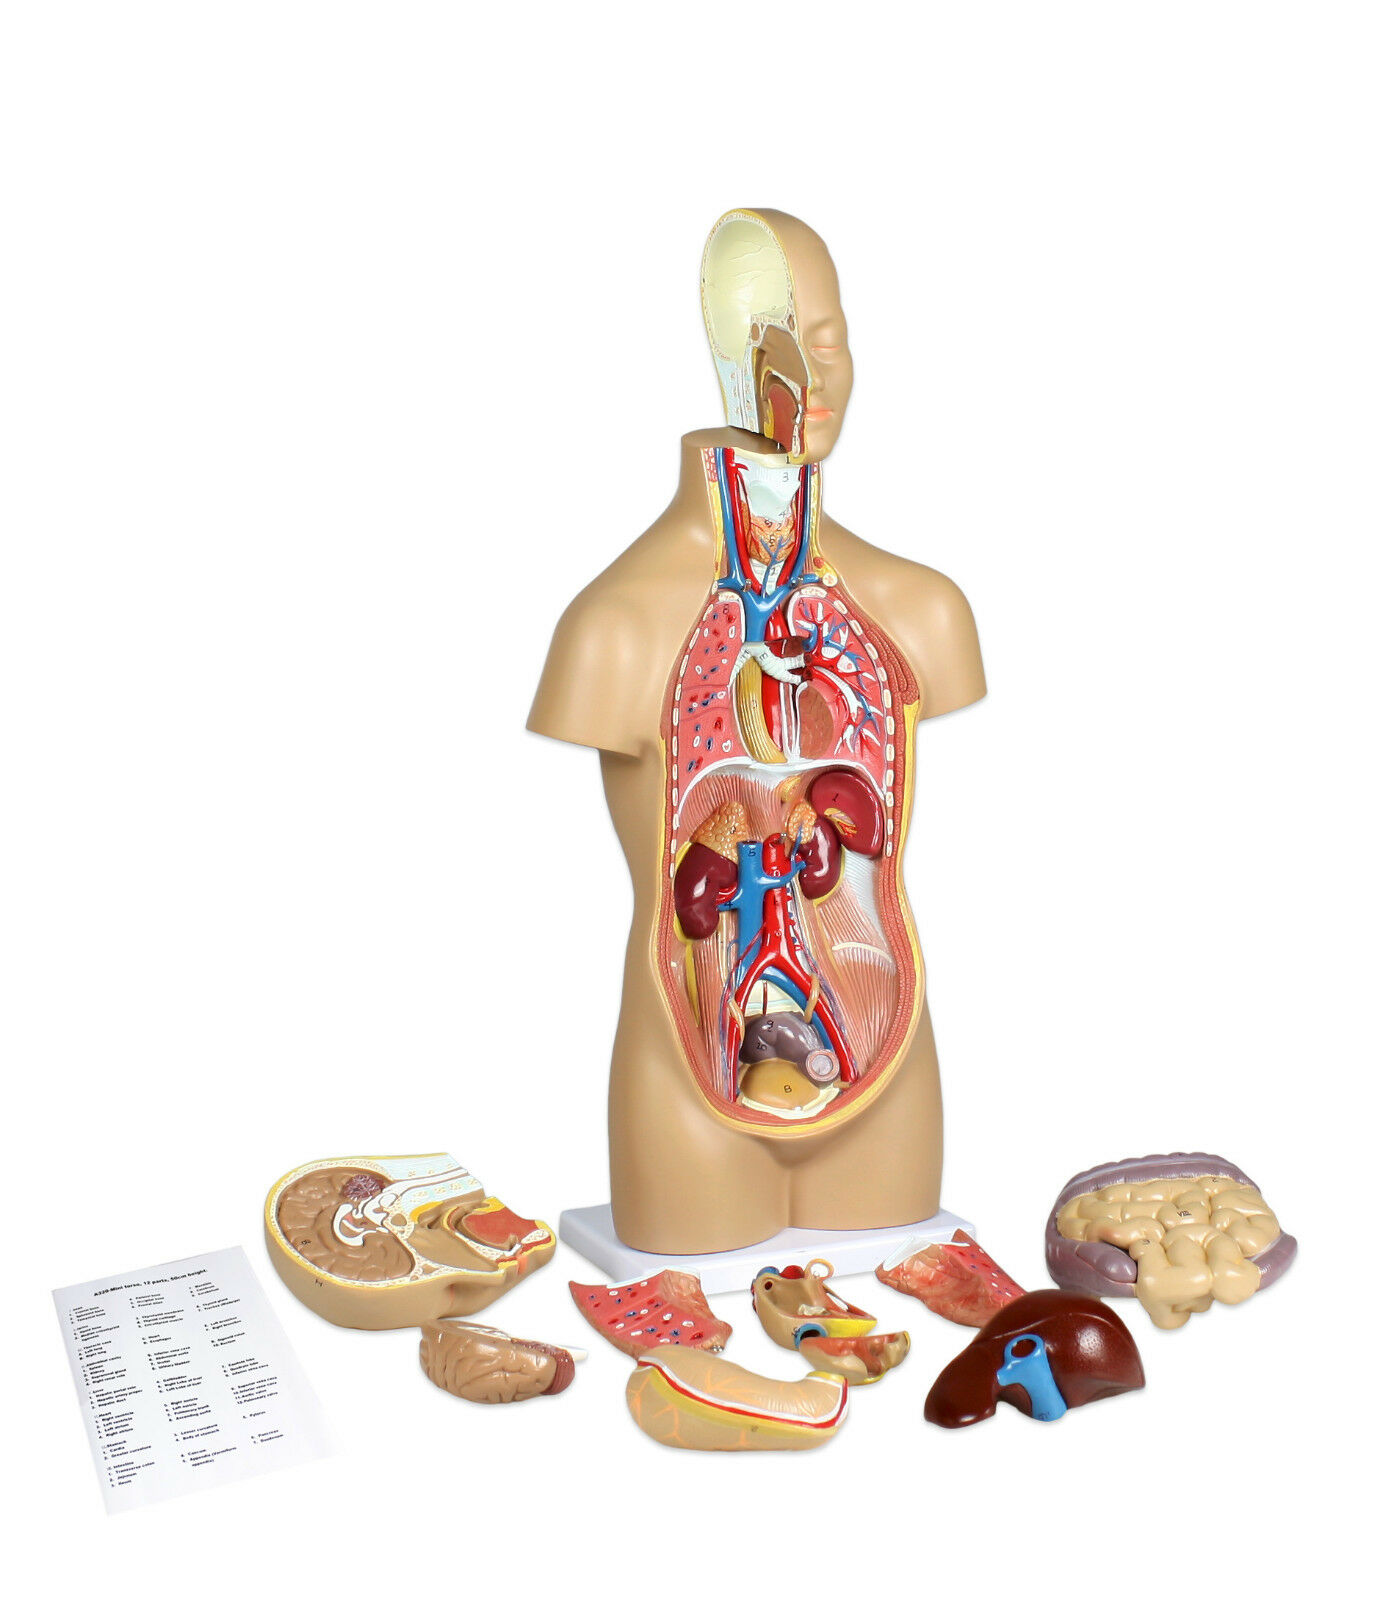 Erfreut Anatomie Torso Modell Markiert Ideen - Anatomie Ideen ...